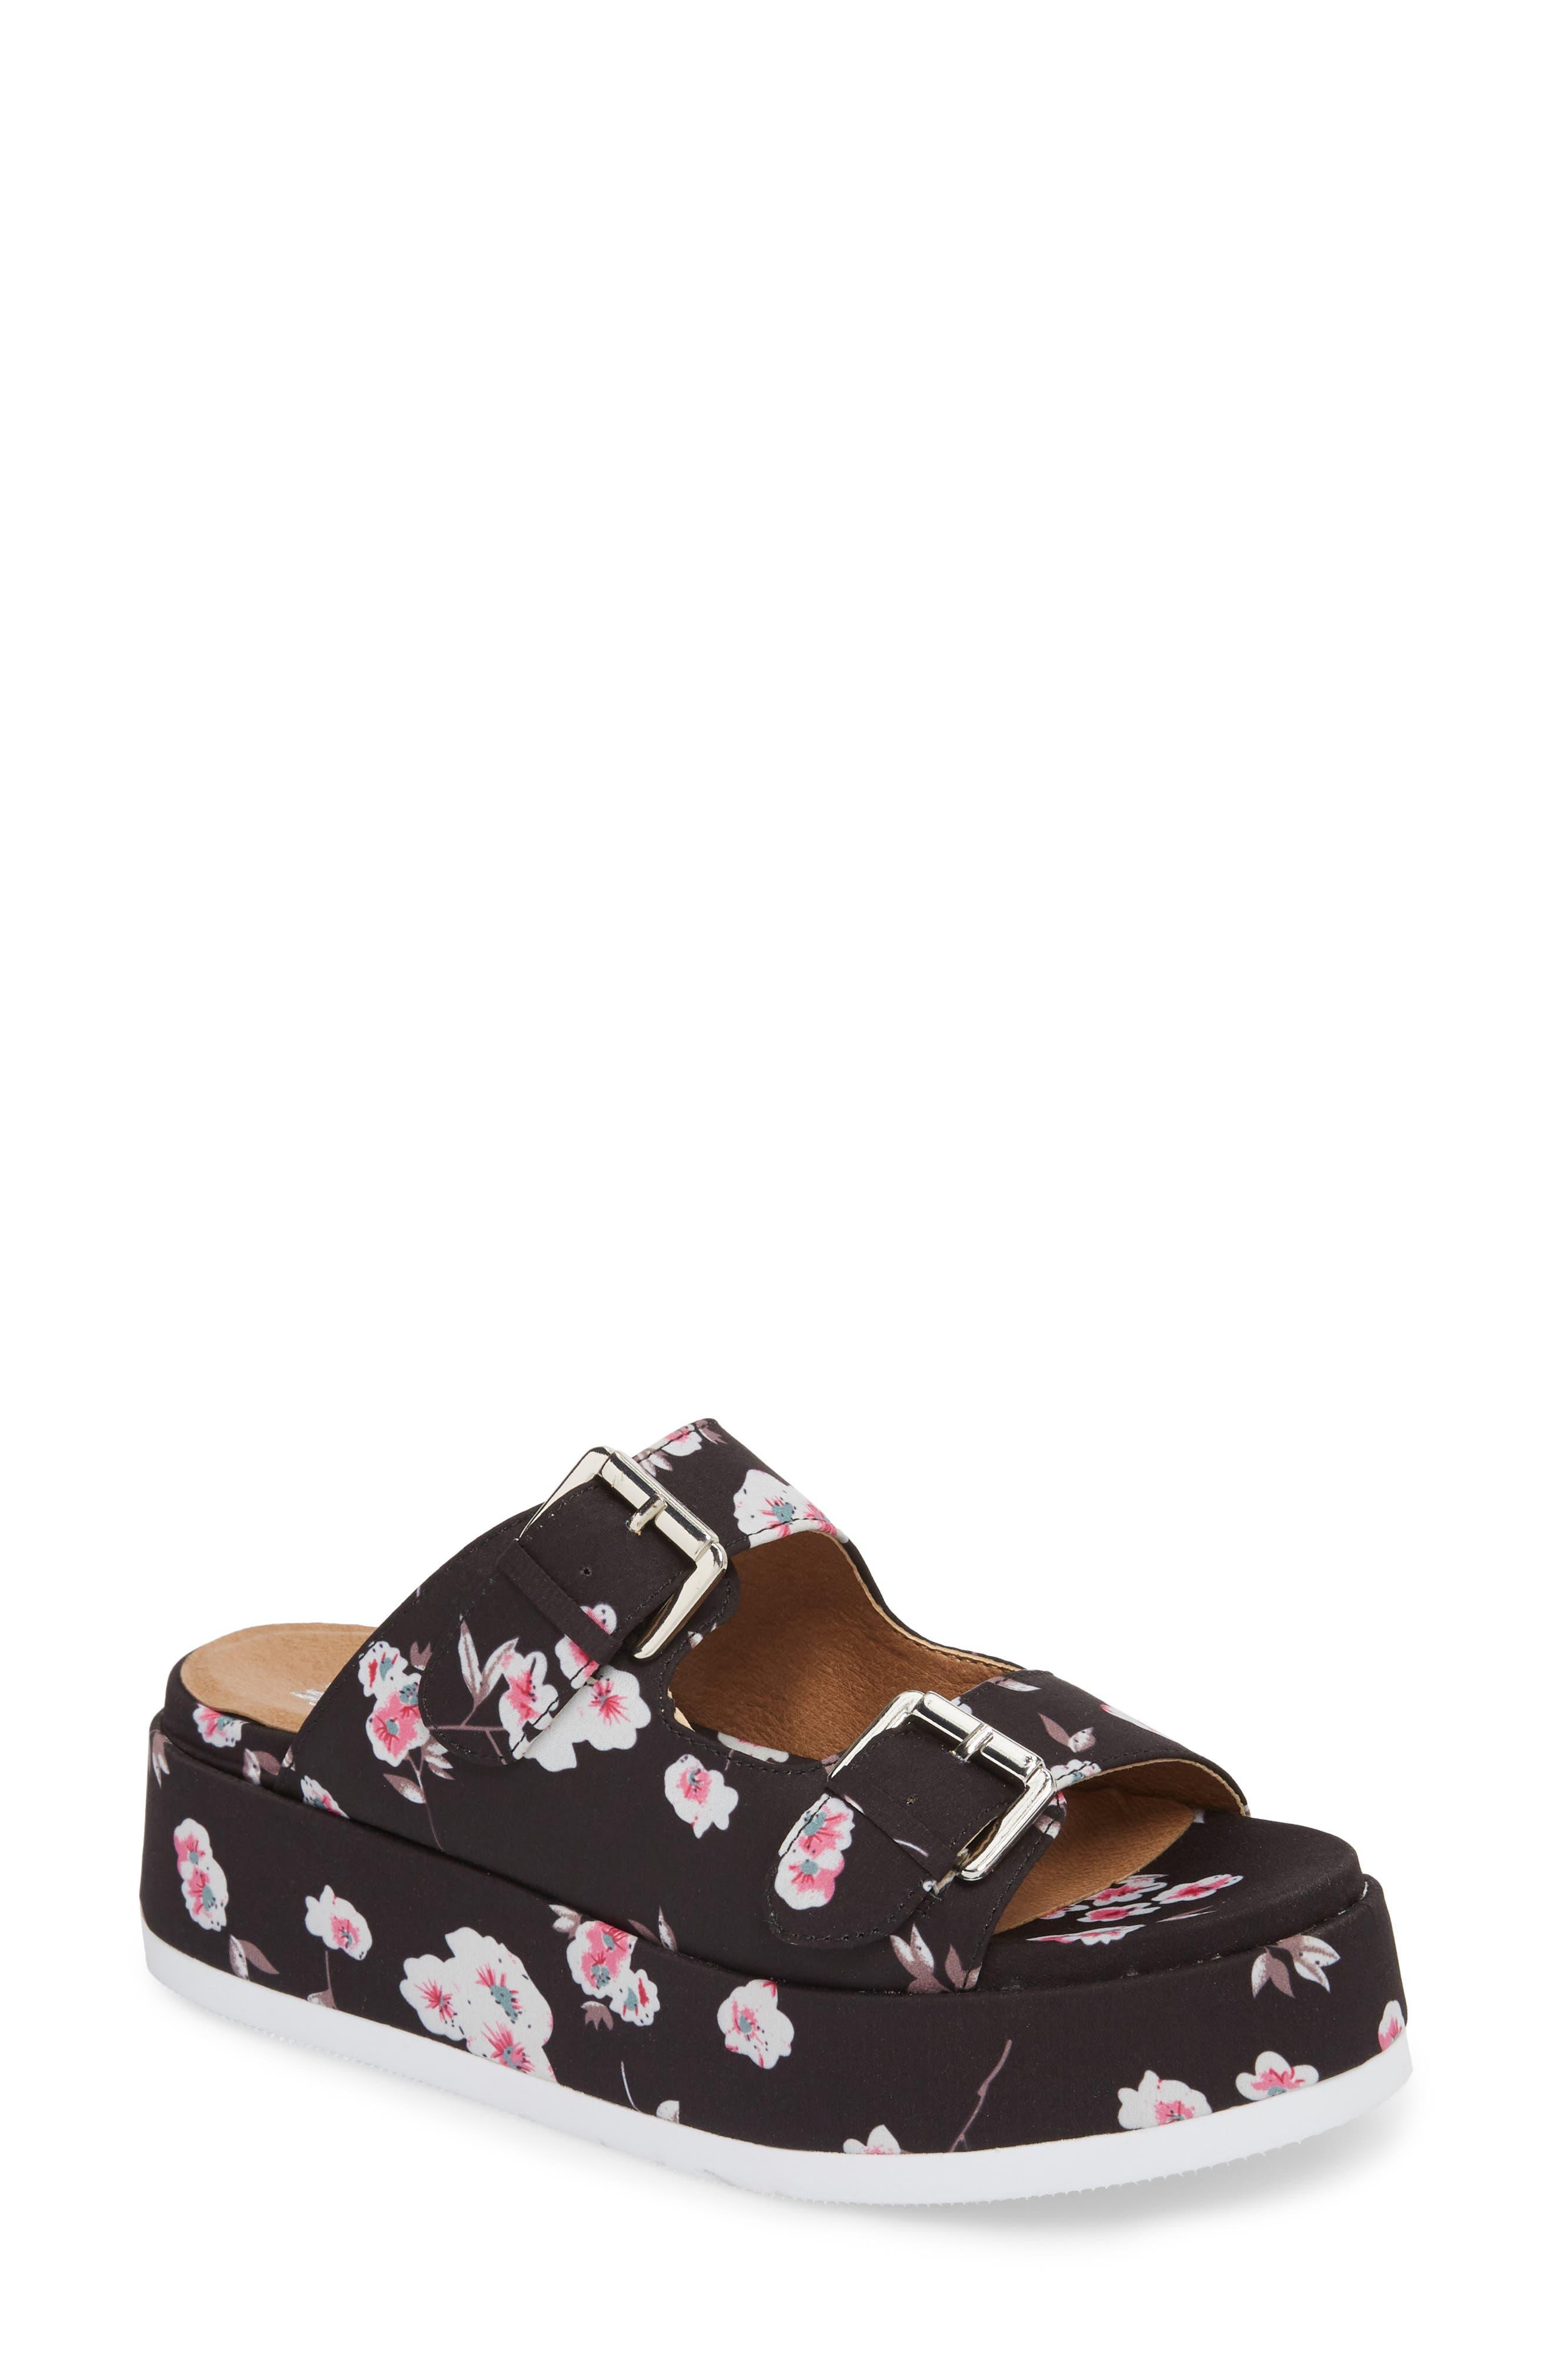 Jordan Two-Buckle Slide Sandal,                         Main,                         color, 001